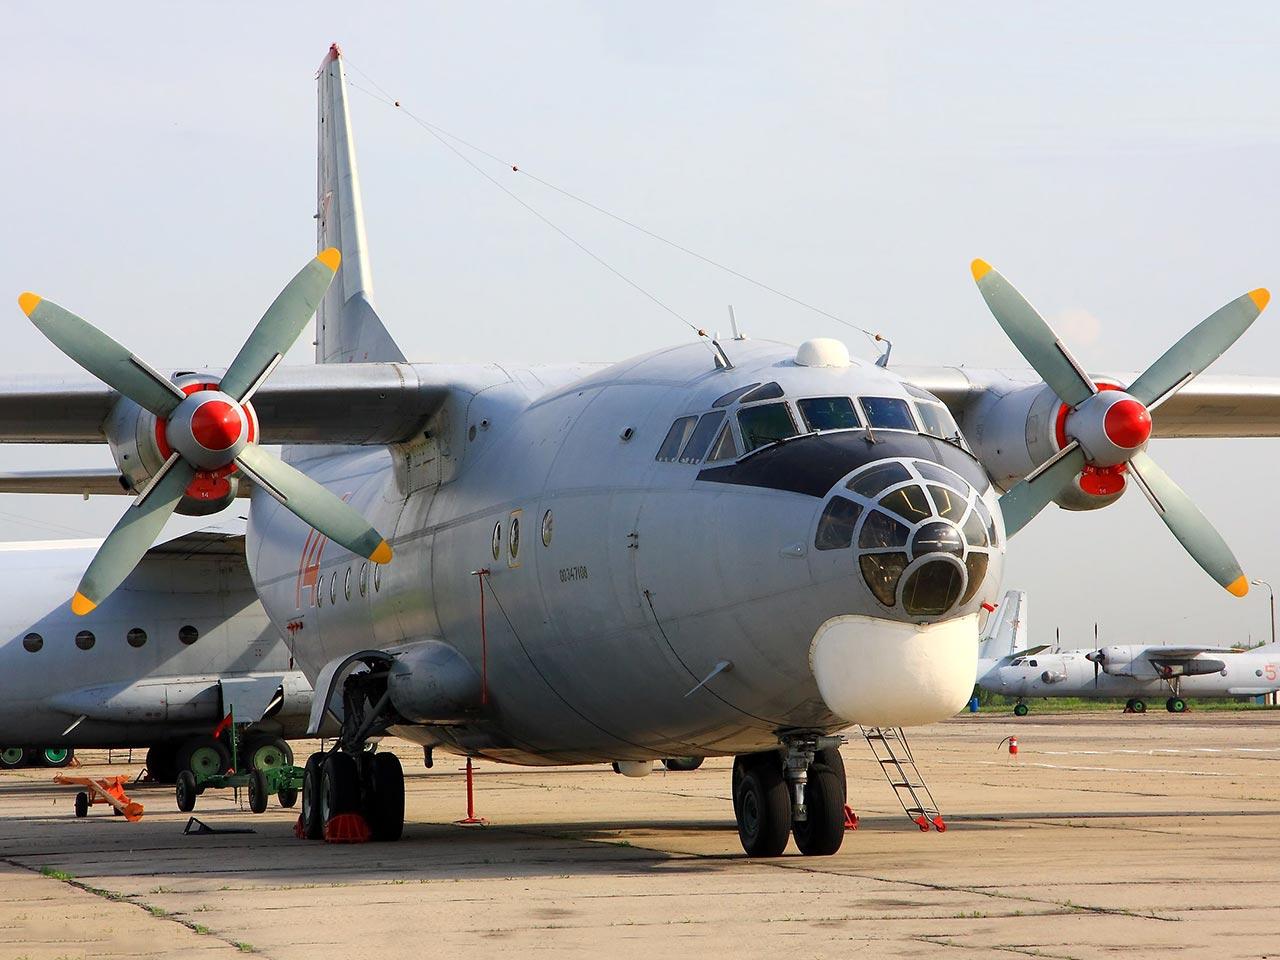 A Russian Antonov AN-26 missing